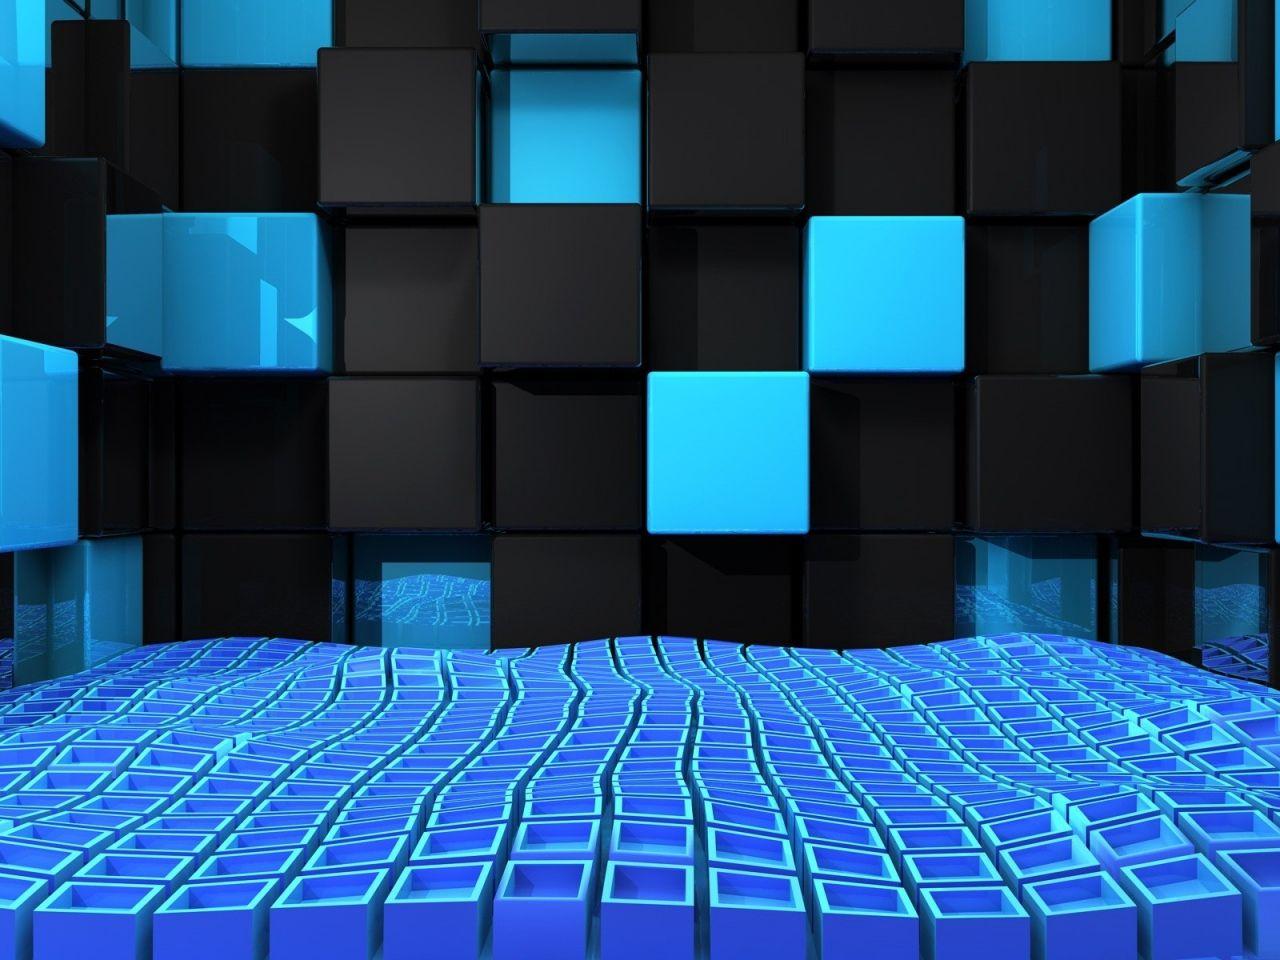 D L U 48x1152 Wallpapers Background Hd Wallpaper 3d Wallpaper For Laptop